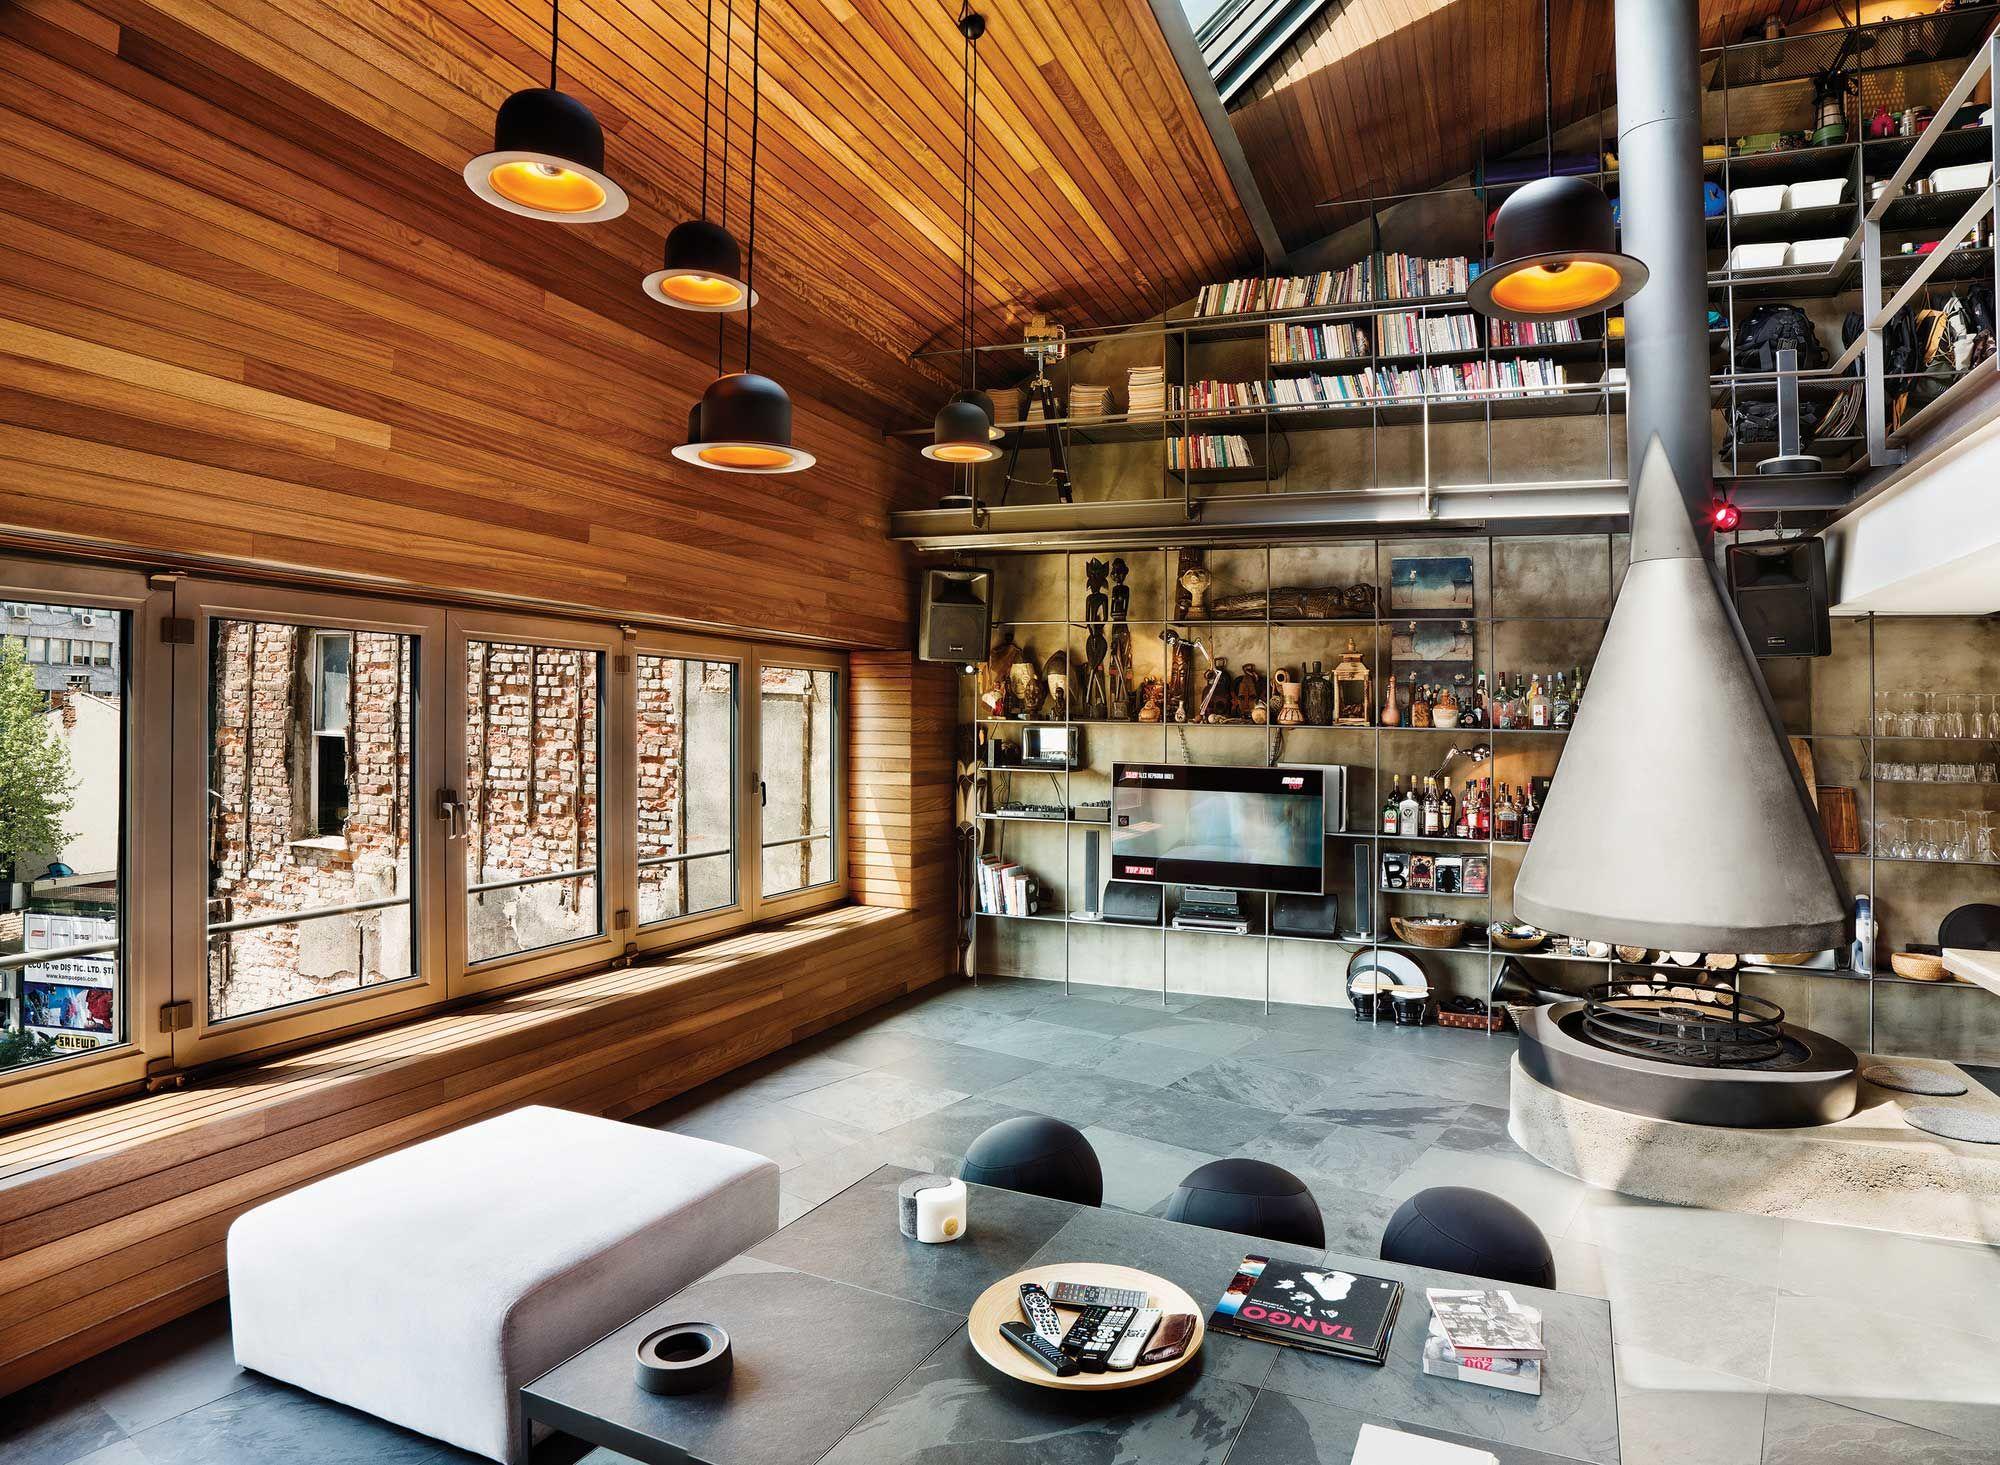 Amazing Turkish Loft in Karakoy [Istanbul] | Dachs, Sofa und Bett